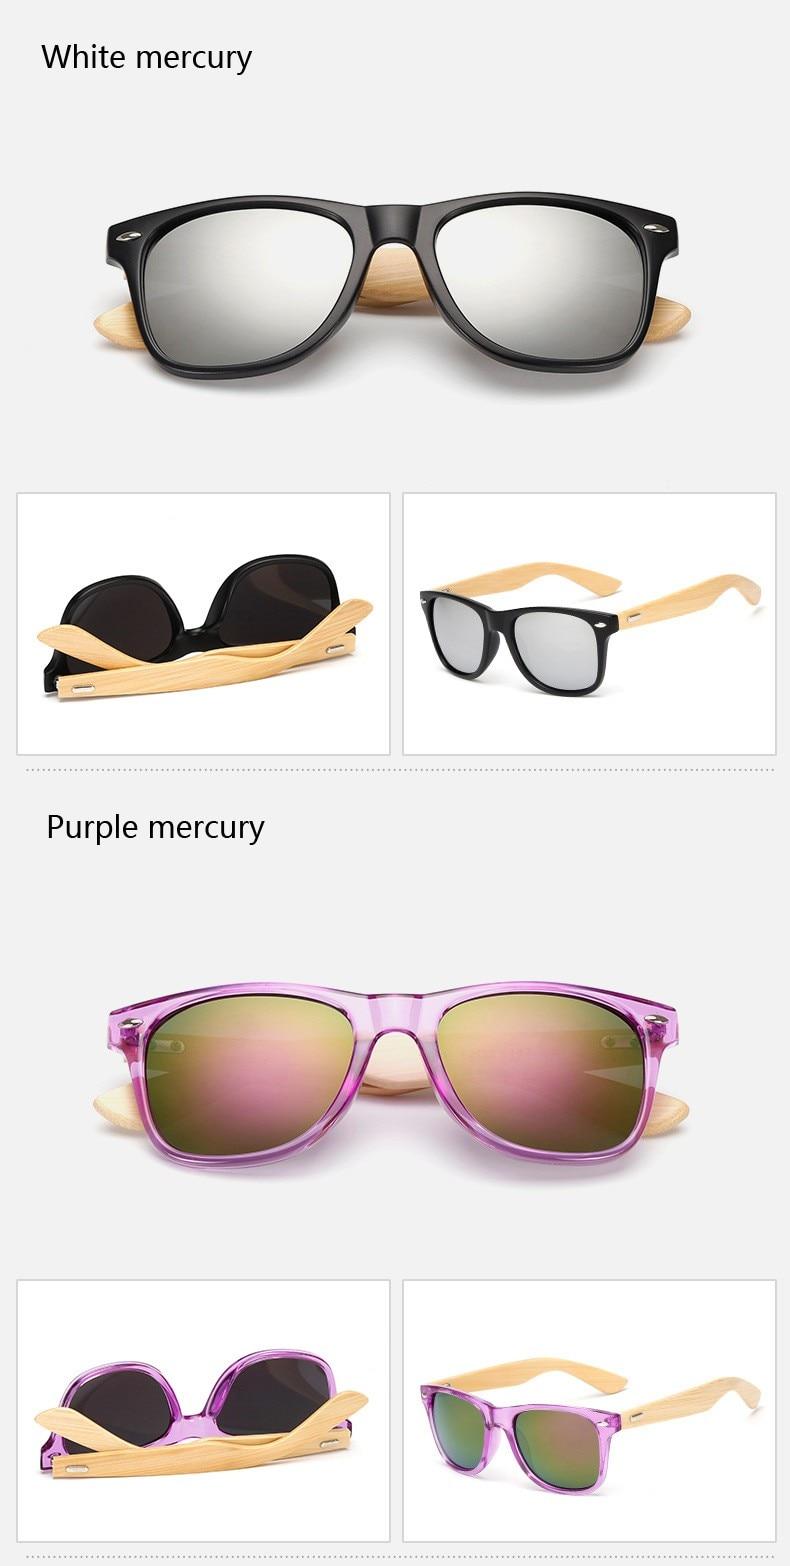 Ralferty Retro Wood Sunglasses Men Bamboo Sunglass Women Brand Design Sport Goggles Gold Mirror Sun Glasses Shades lunette oculo 12